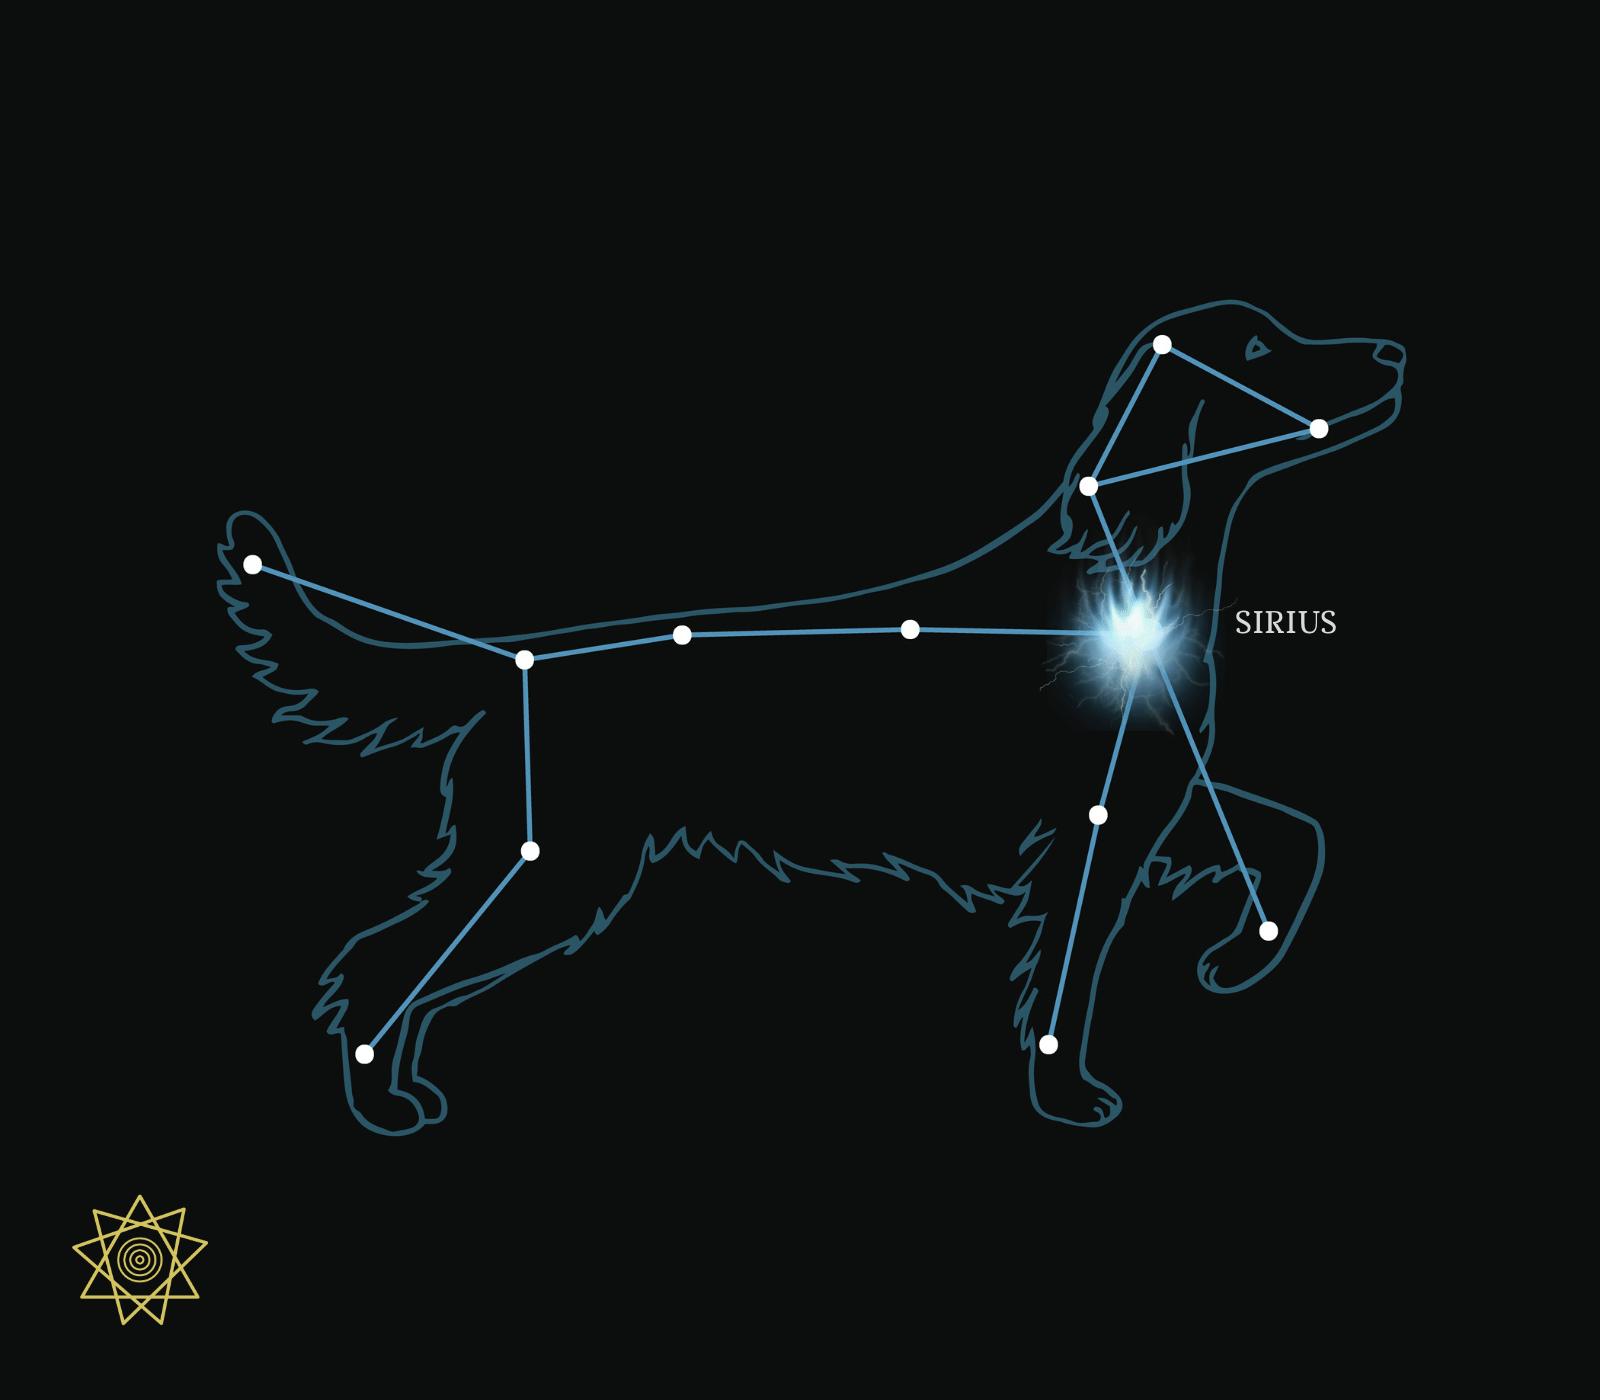 Stellar Code Sirius Feedback